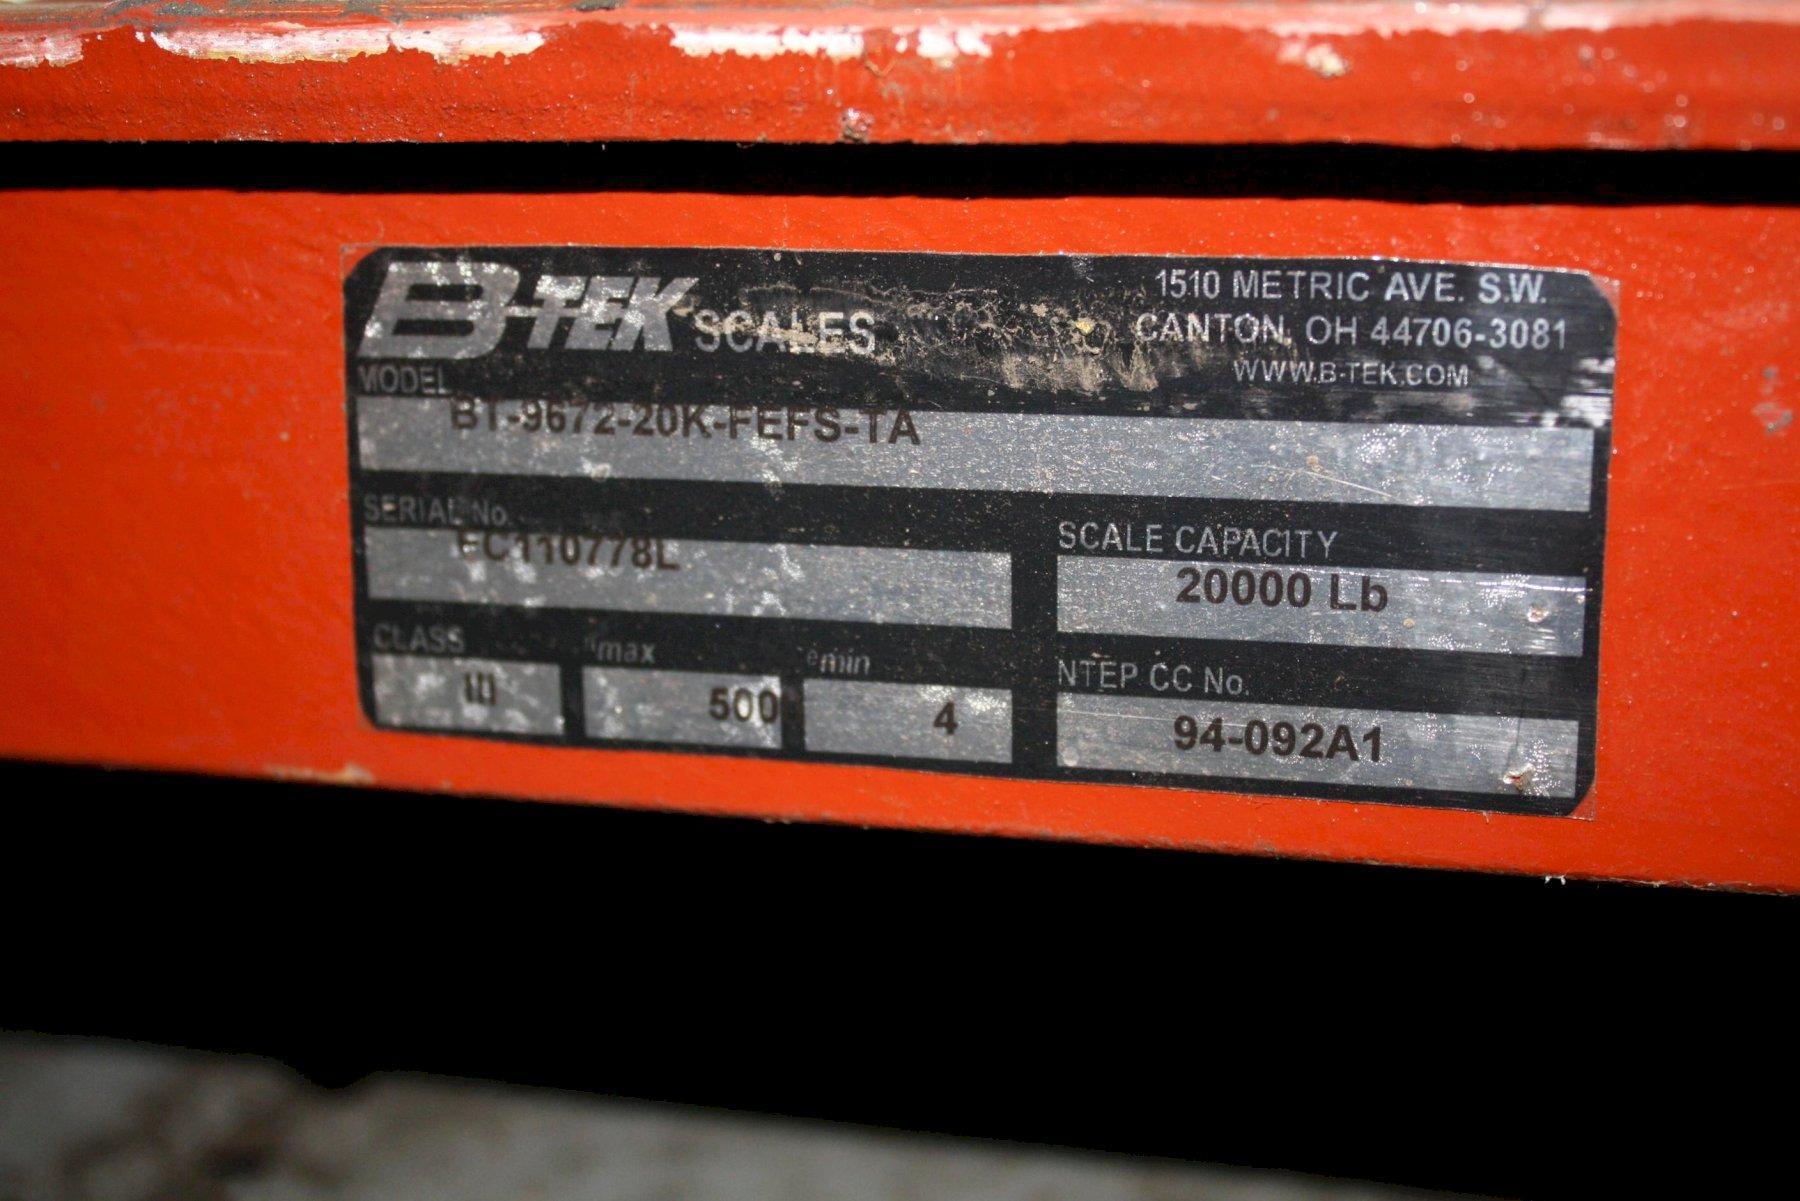 20,000 LB B-TEK PLATFORM SALE: STOCK #66508